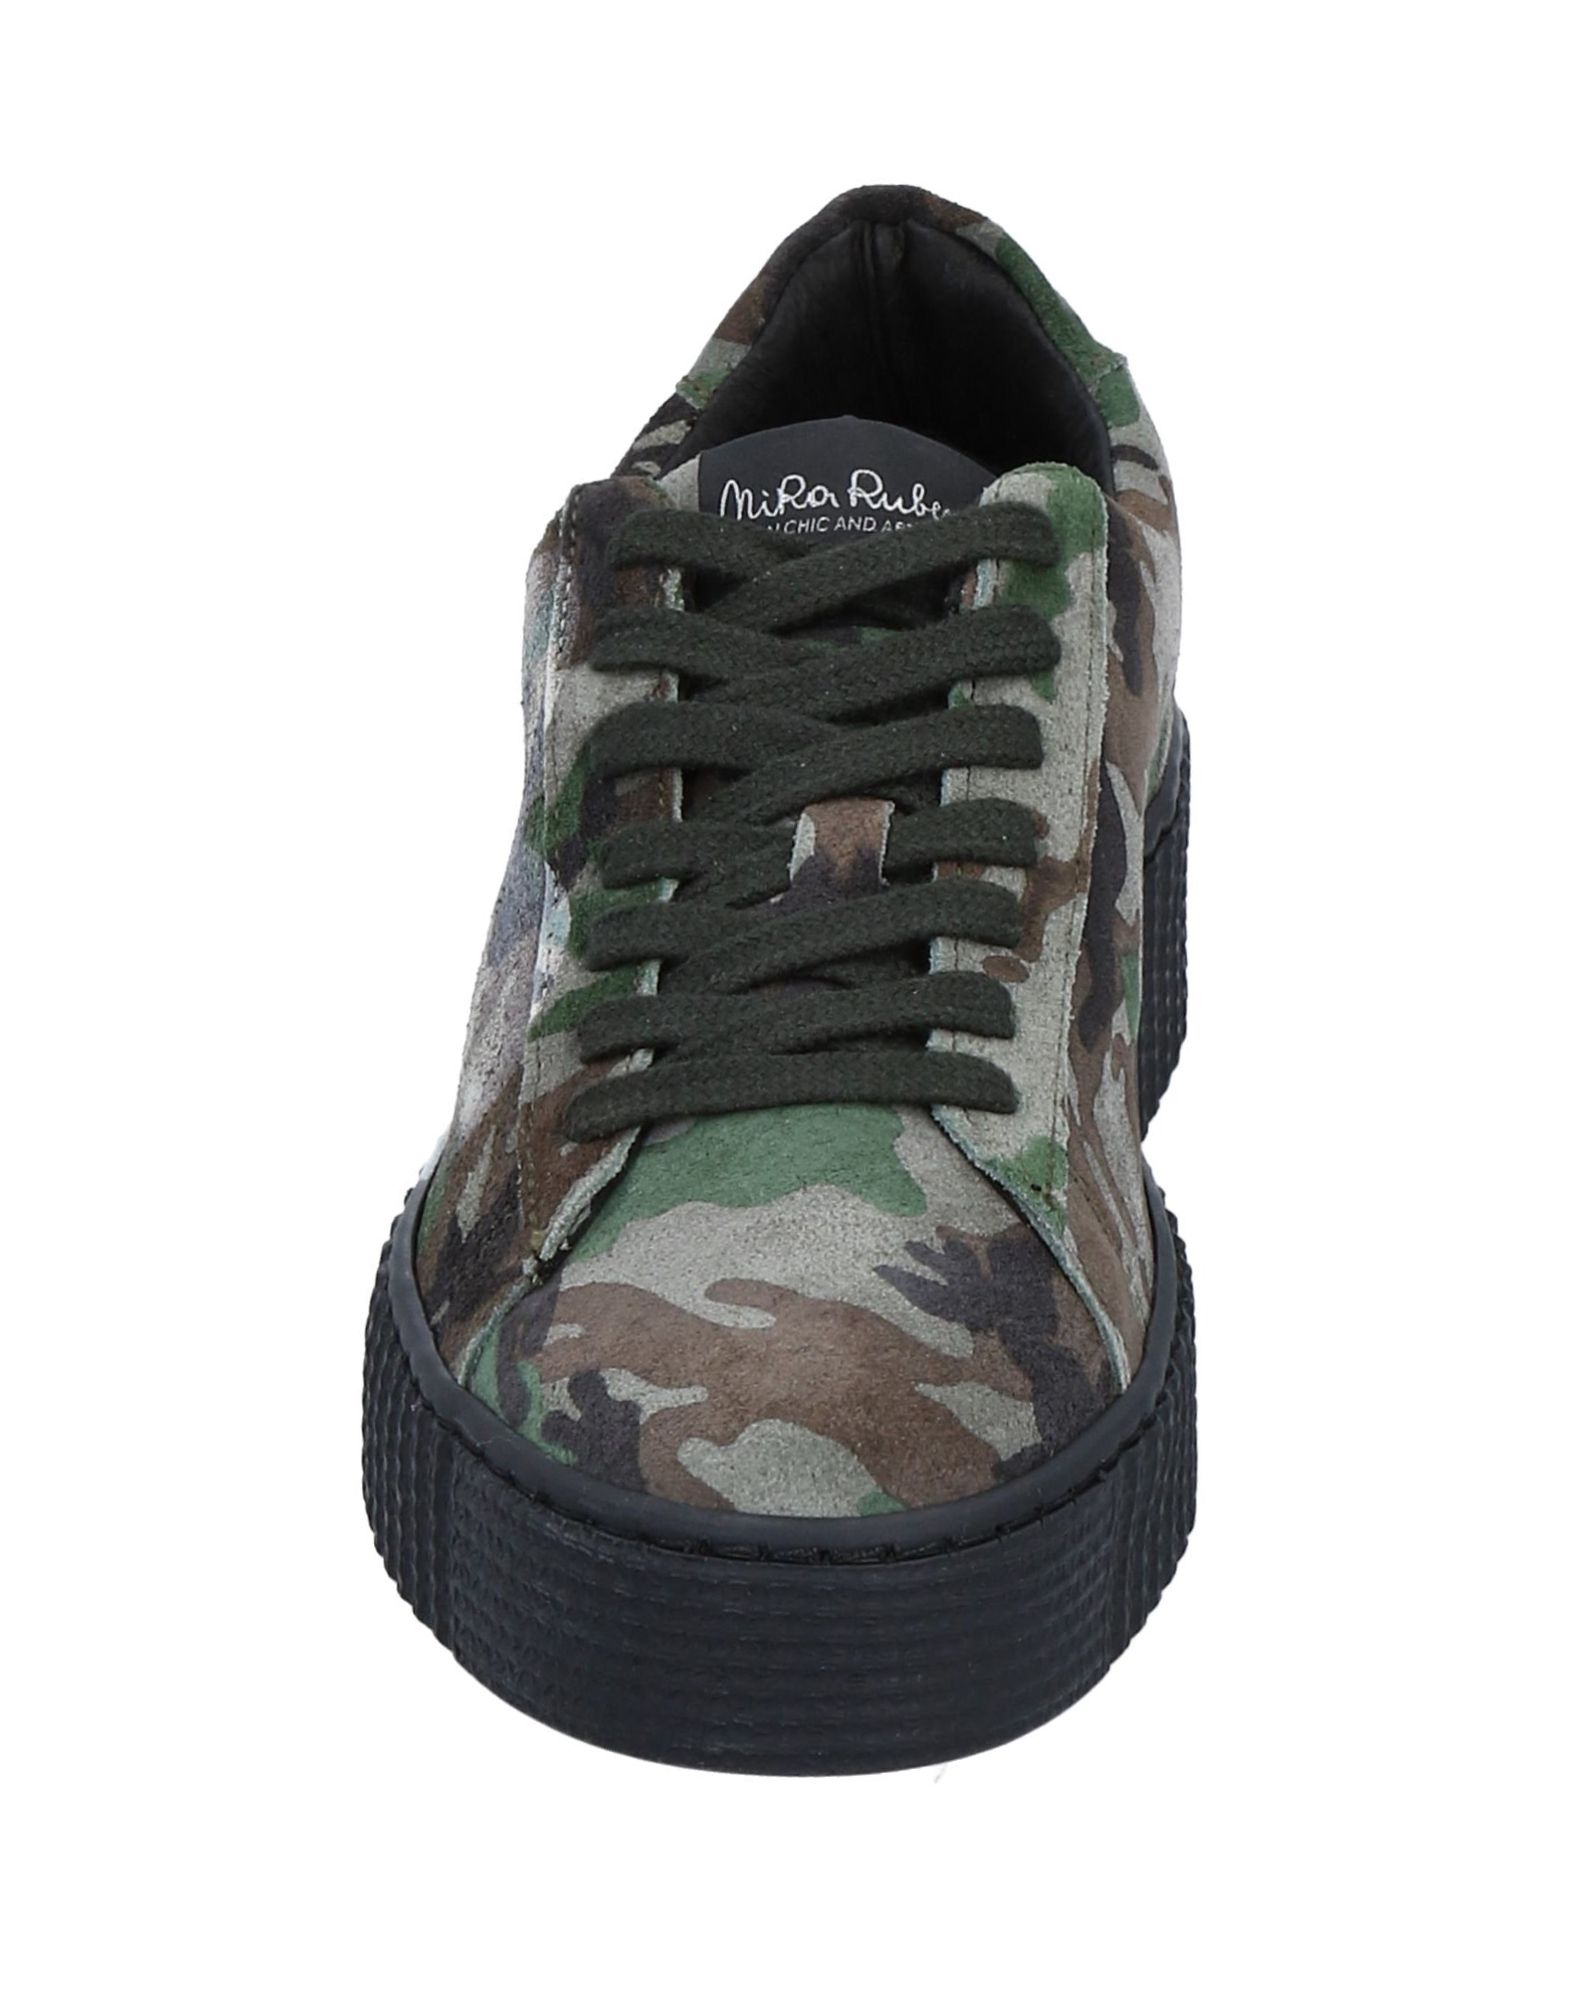 Gut Rubens um billige Schuhe zu tragenNira Rubens Gut Sneakers Damen  11534021XP 8bbaca